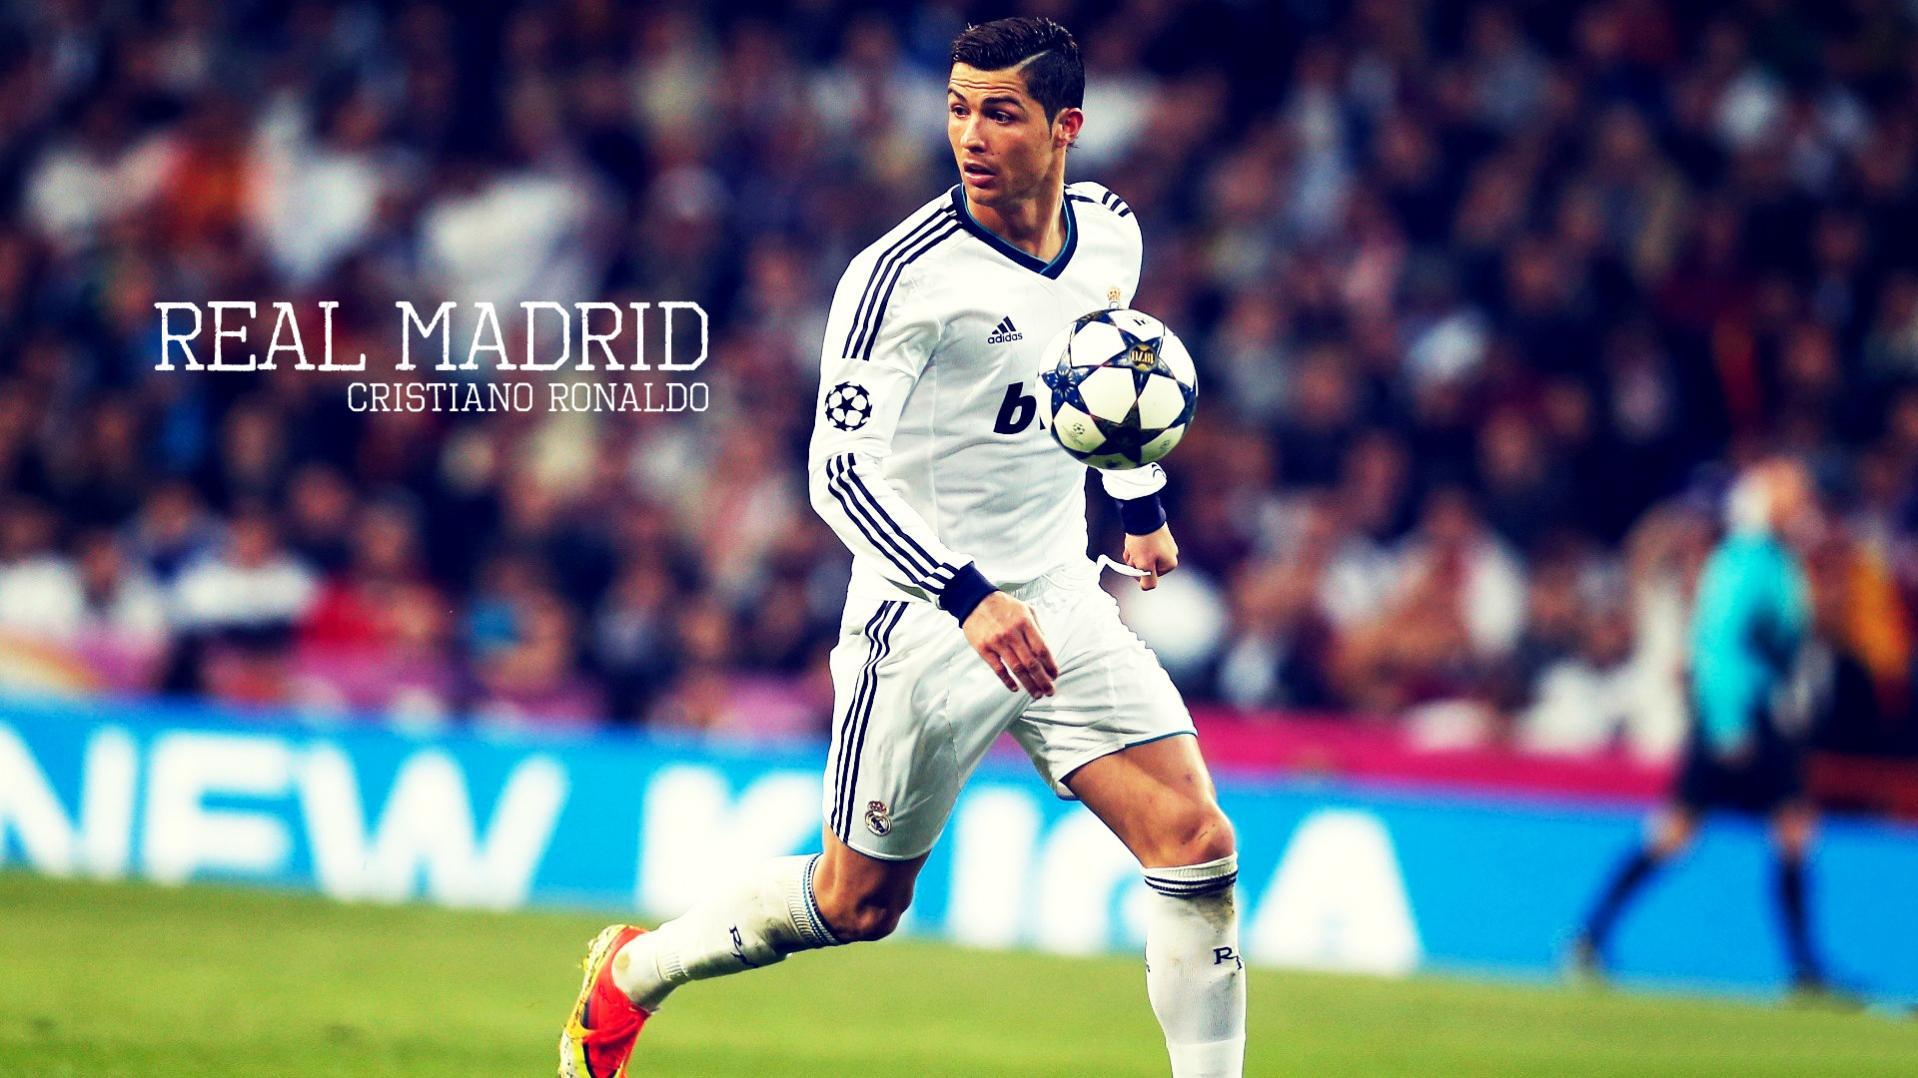 C. Ronaldo Wallpapers HD 2015